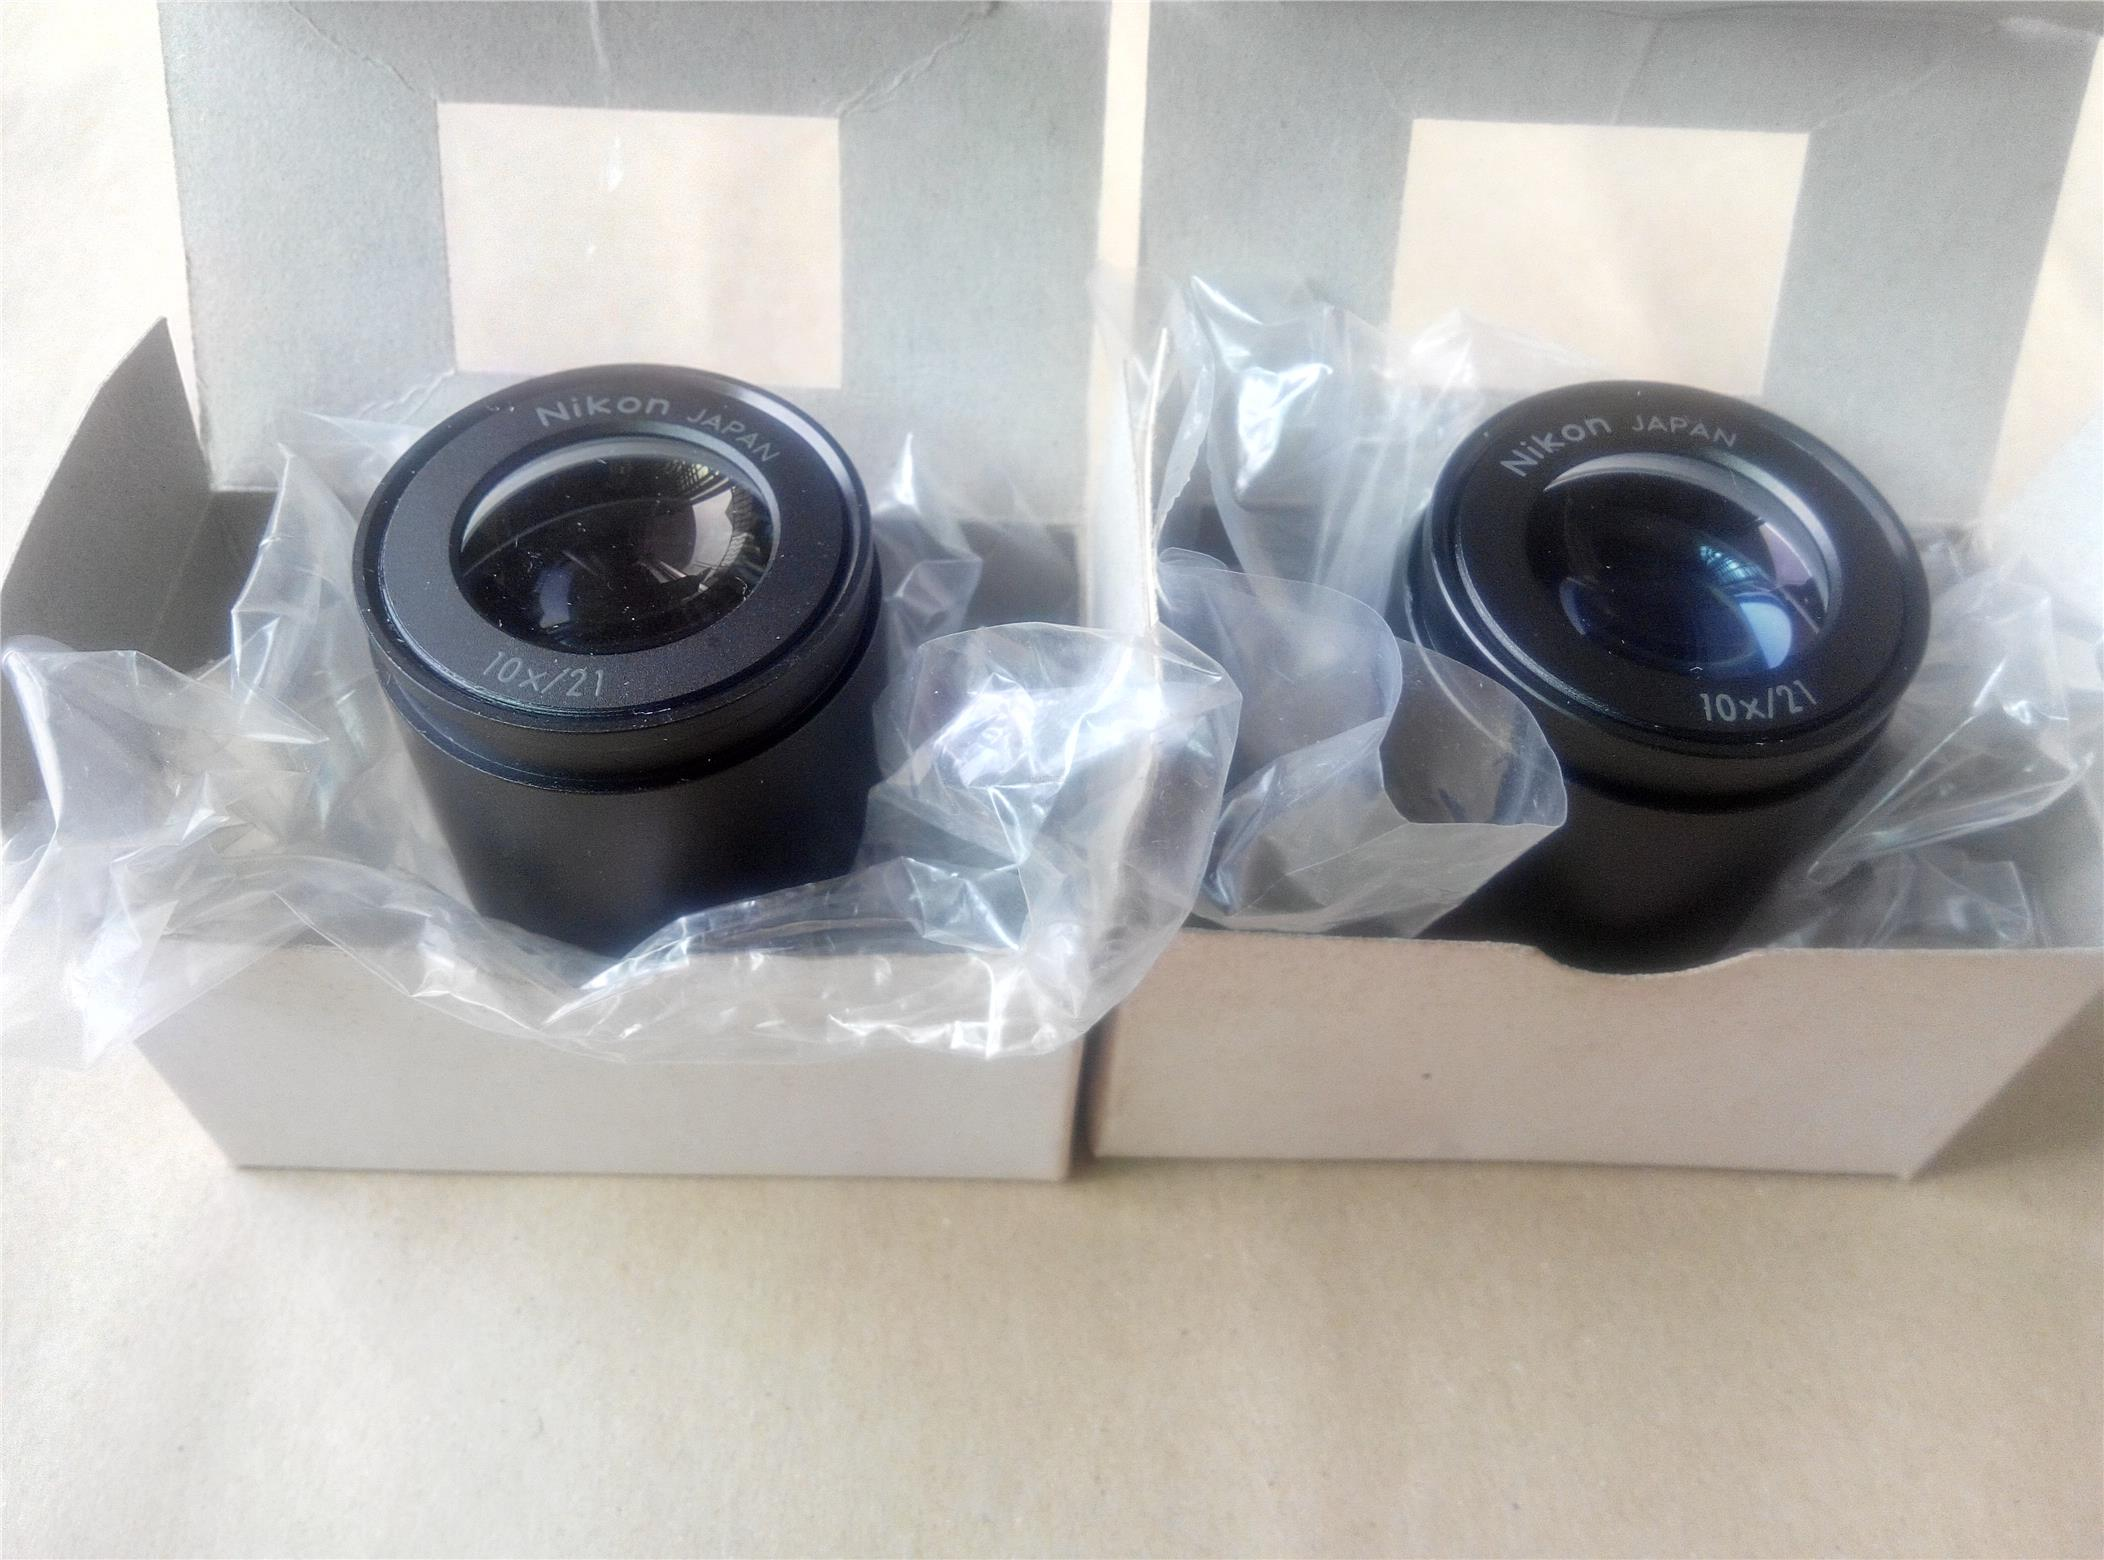 Pair Nikon 10x/21 10x Stereo Microscope Eyepiece Lens (New)